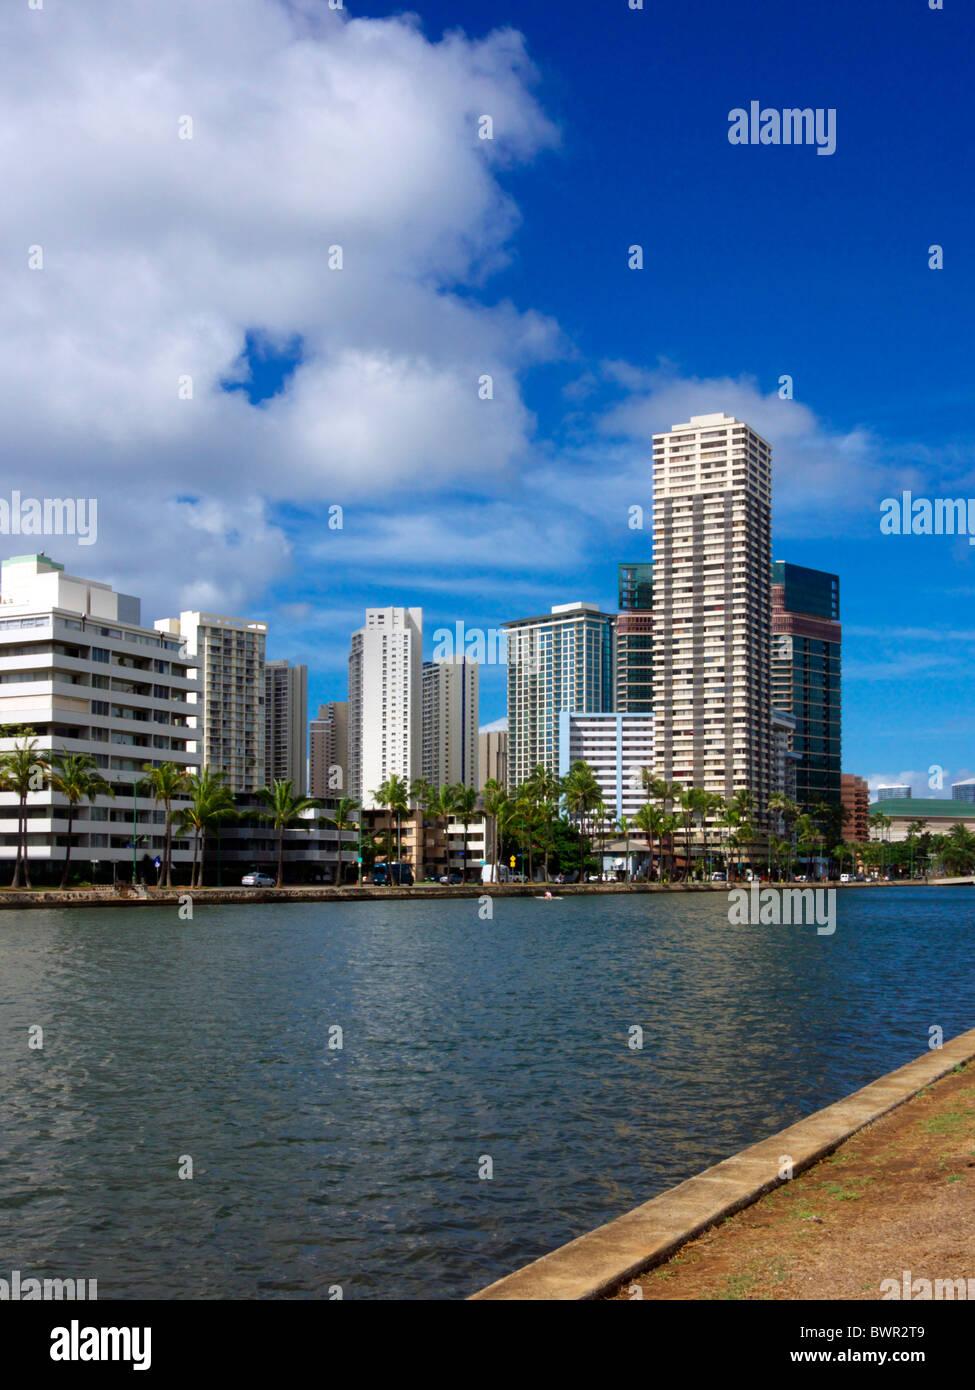 Ala Wai Canal, Honolulu Immagini Stock